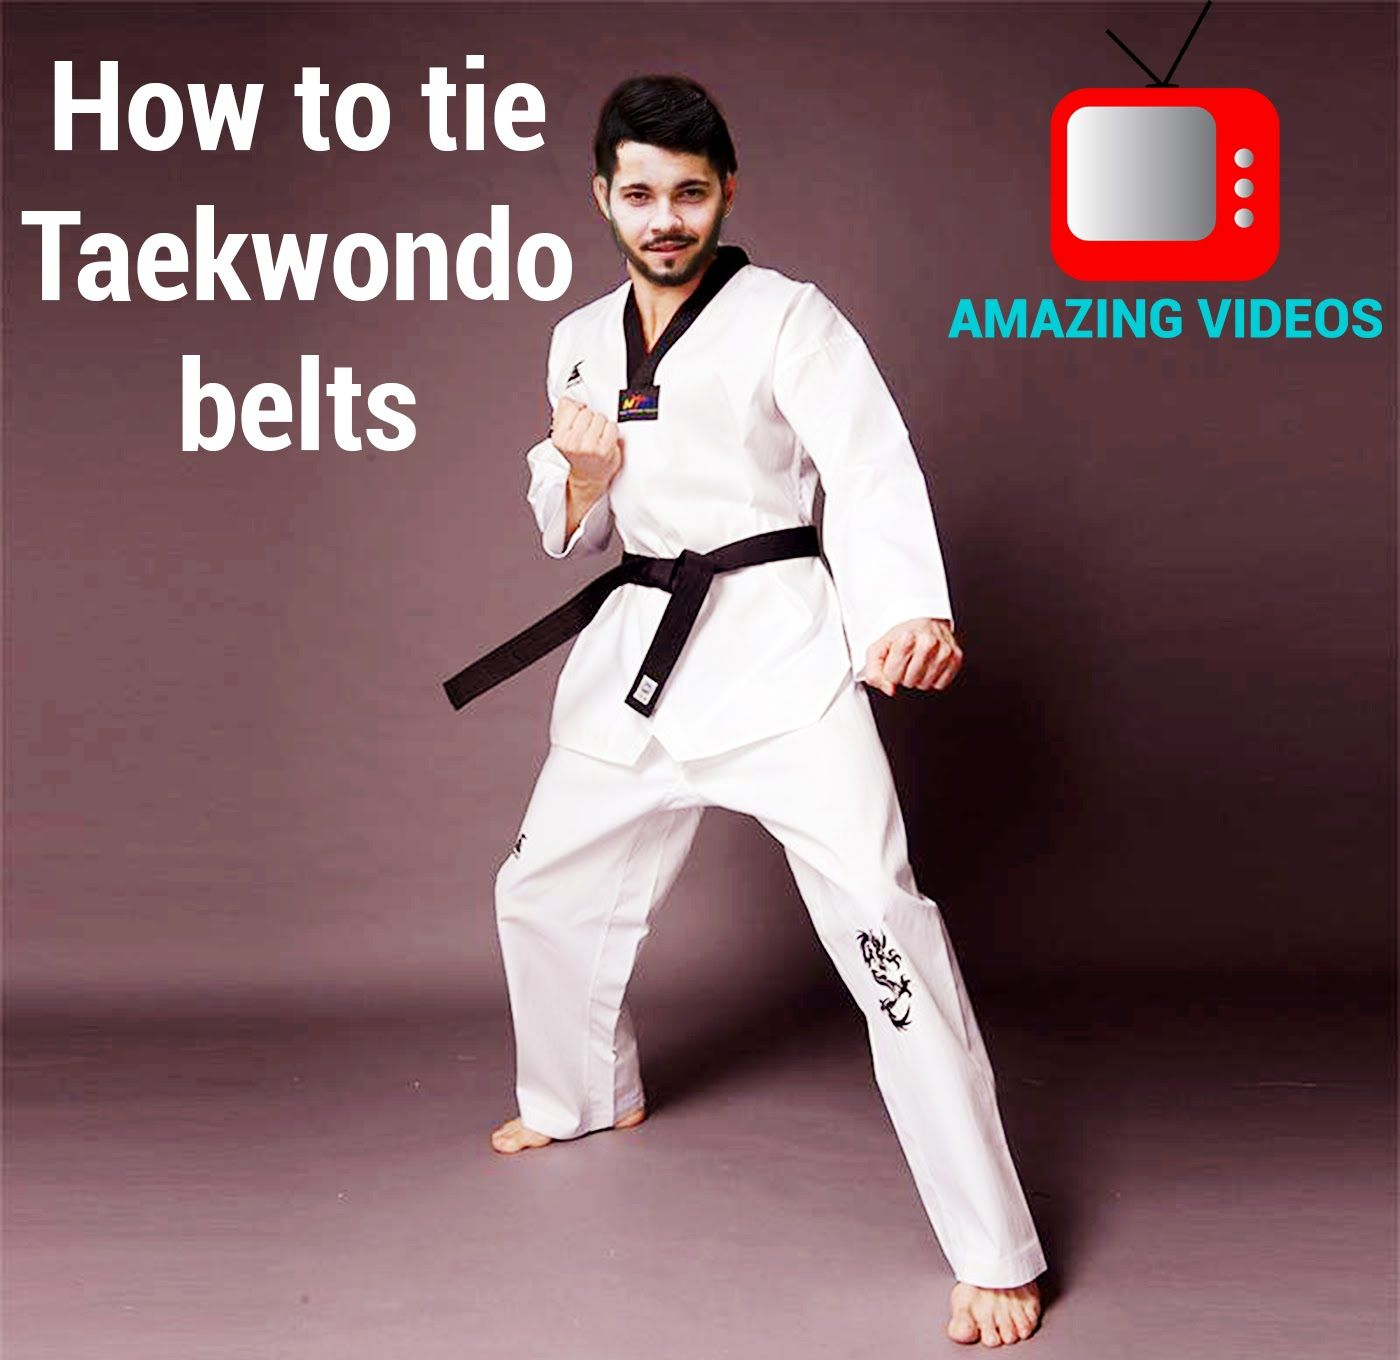 Taekwondo - How to tie Taekwondo belts - Taekwondo Olympics rio 2016 simple Step-by-step tutorial